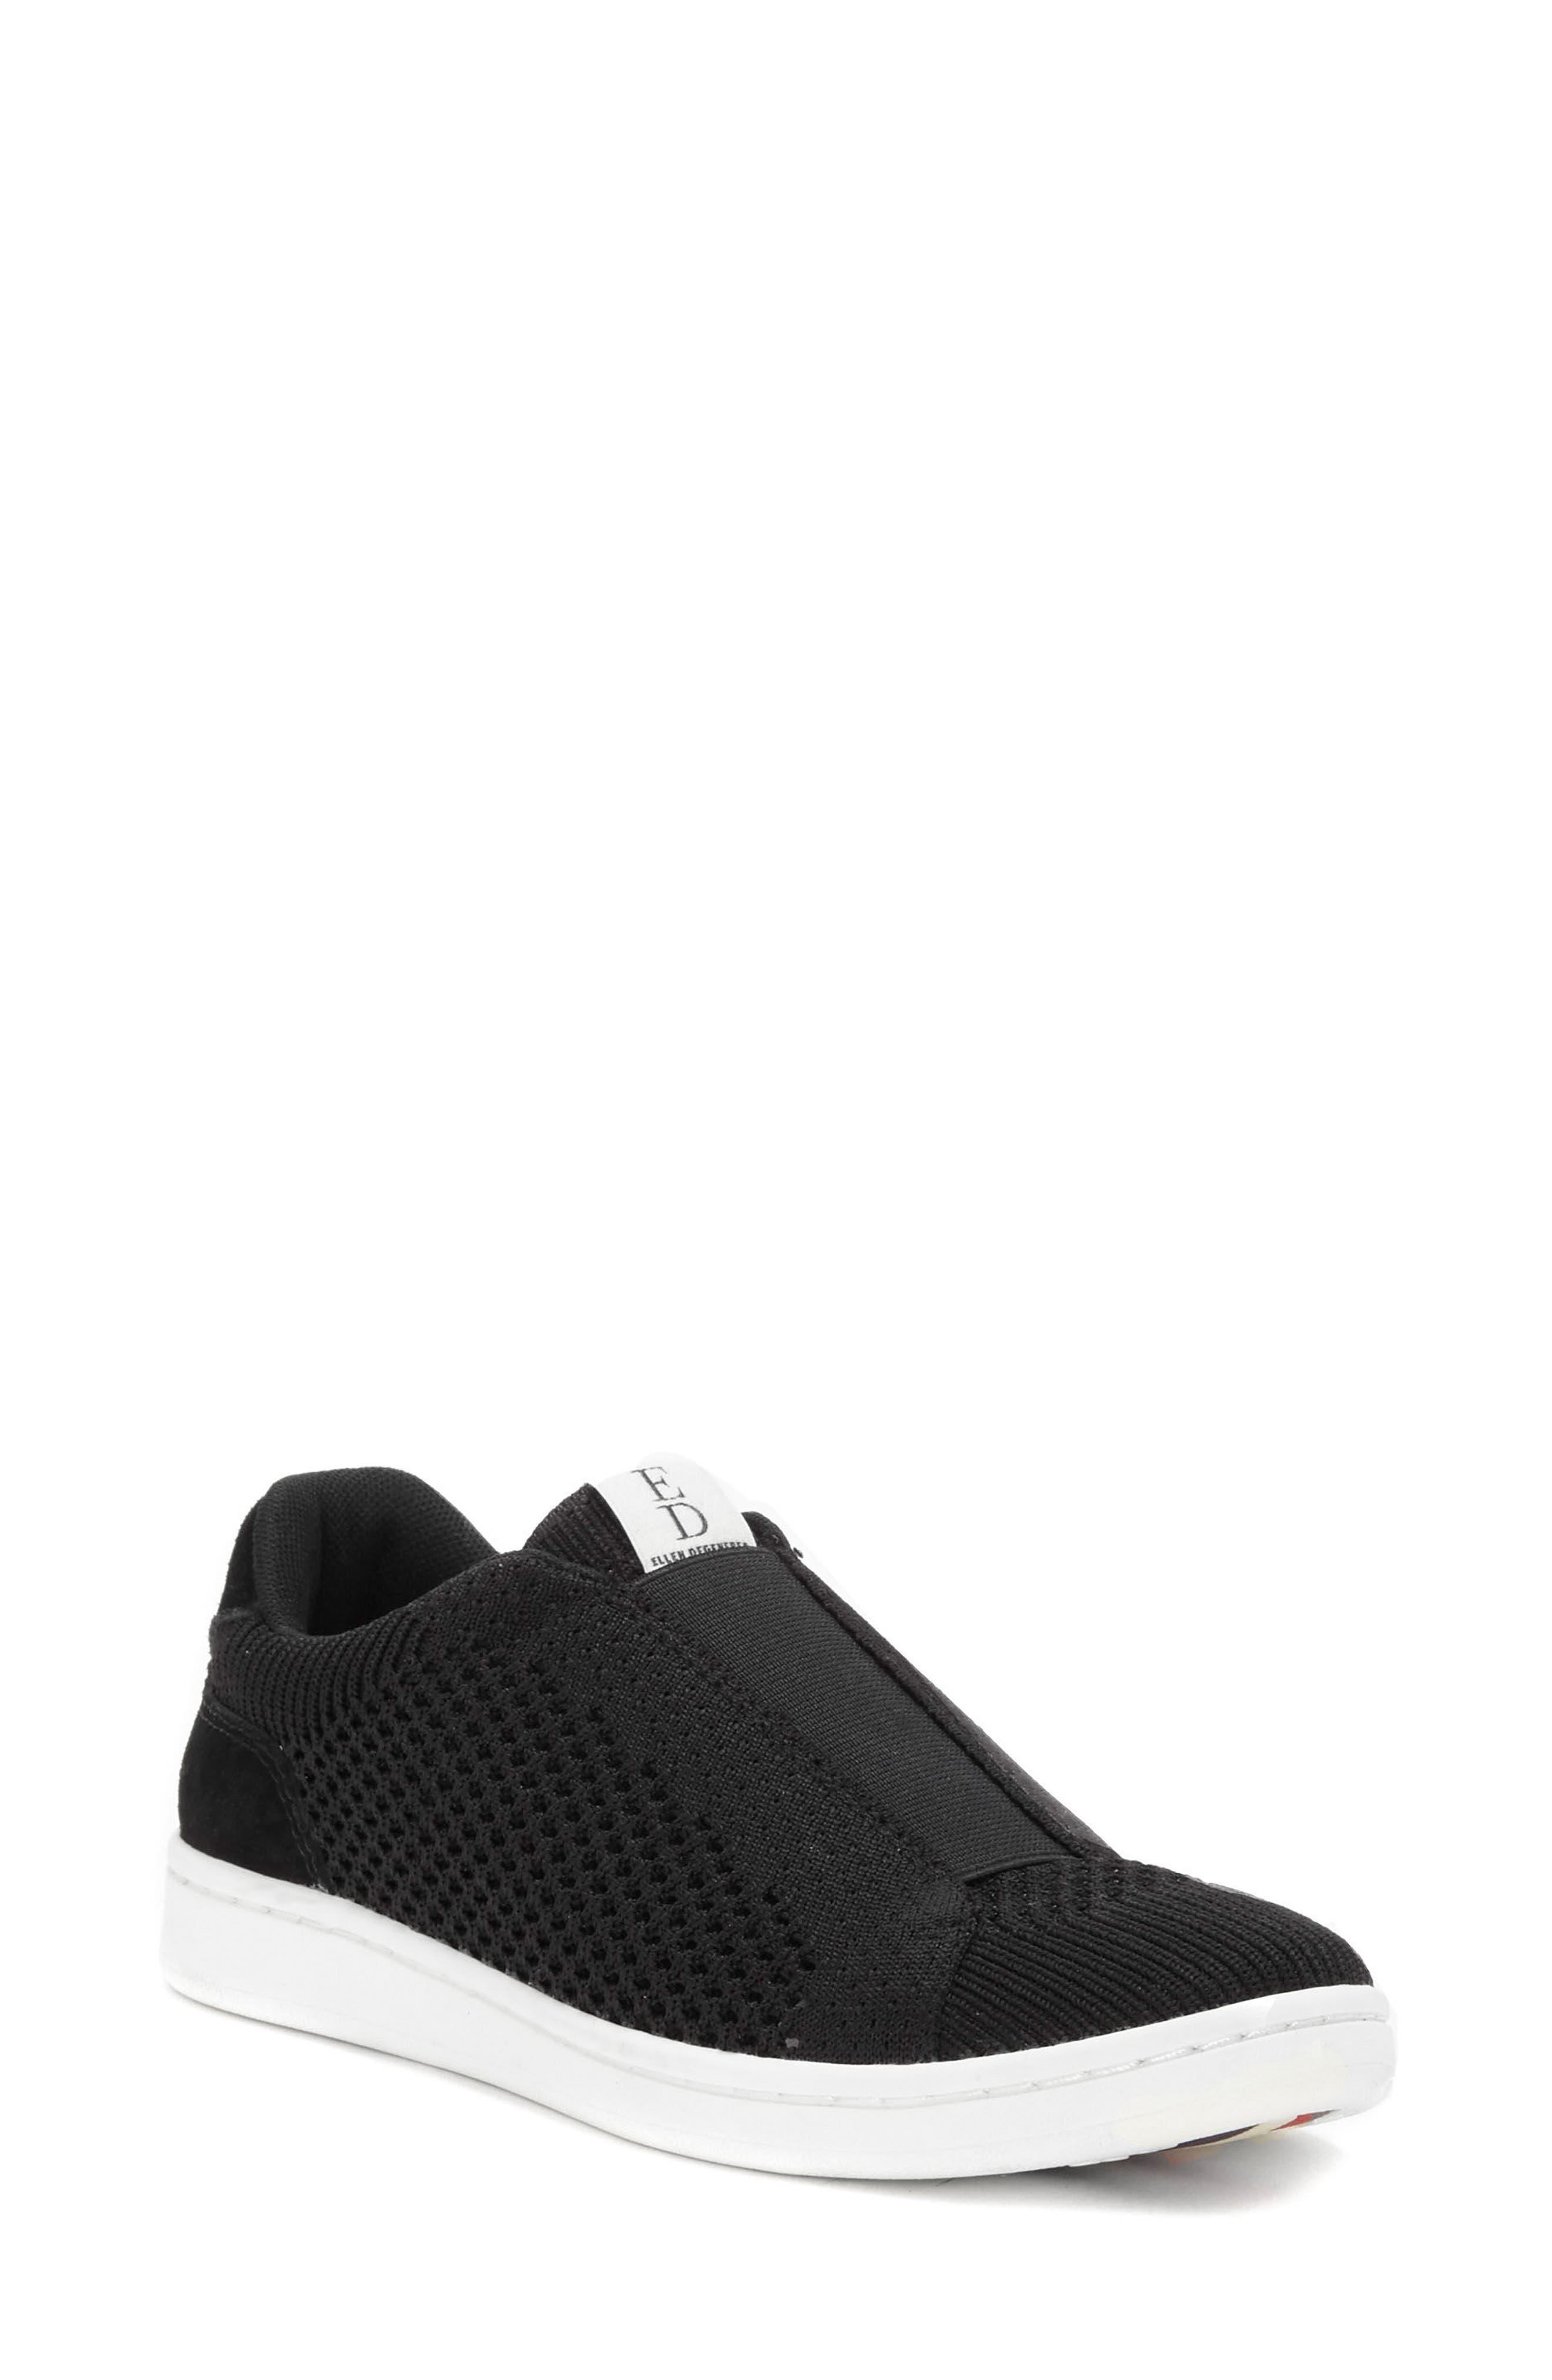 Casbey Slip-On Sneaker,                             Main thumbnail 1, color,                             BLACK/ BLACK FABRIC